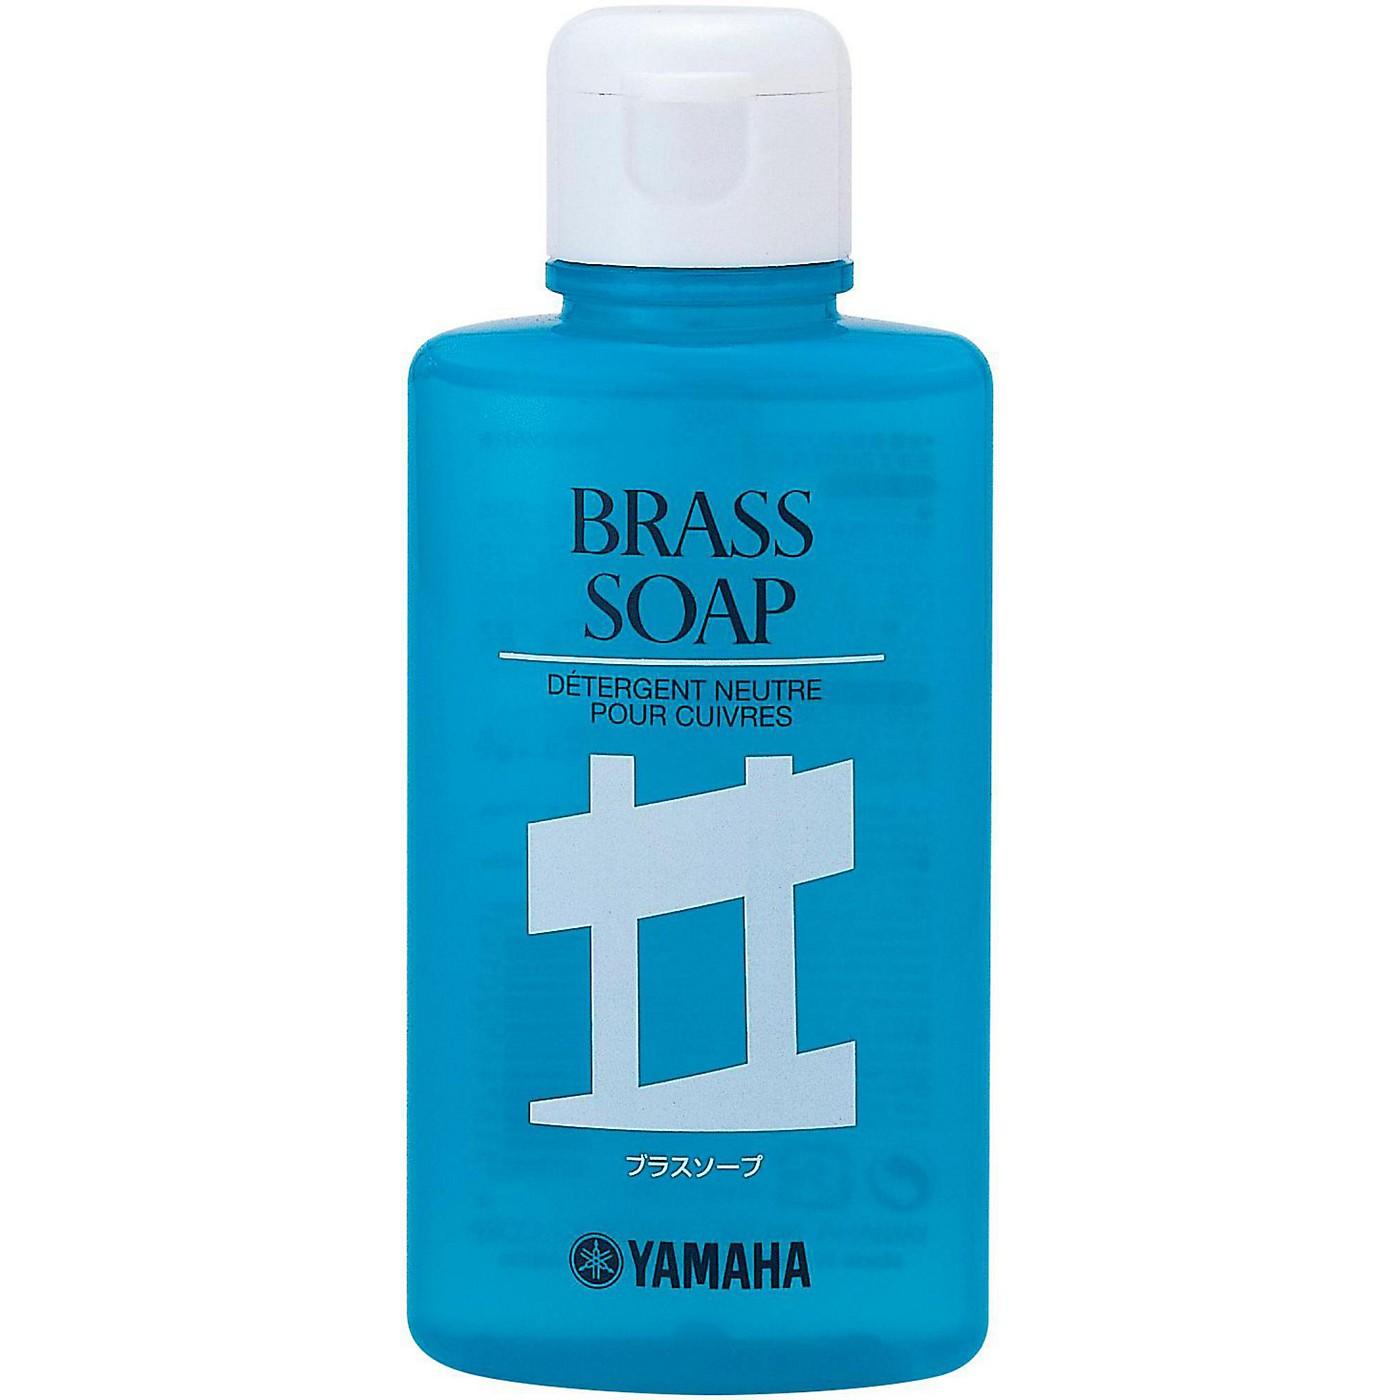 Yamaha Brass Soap thumbnail